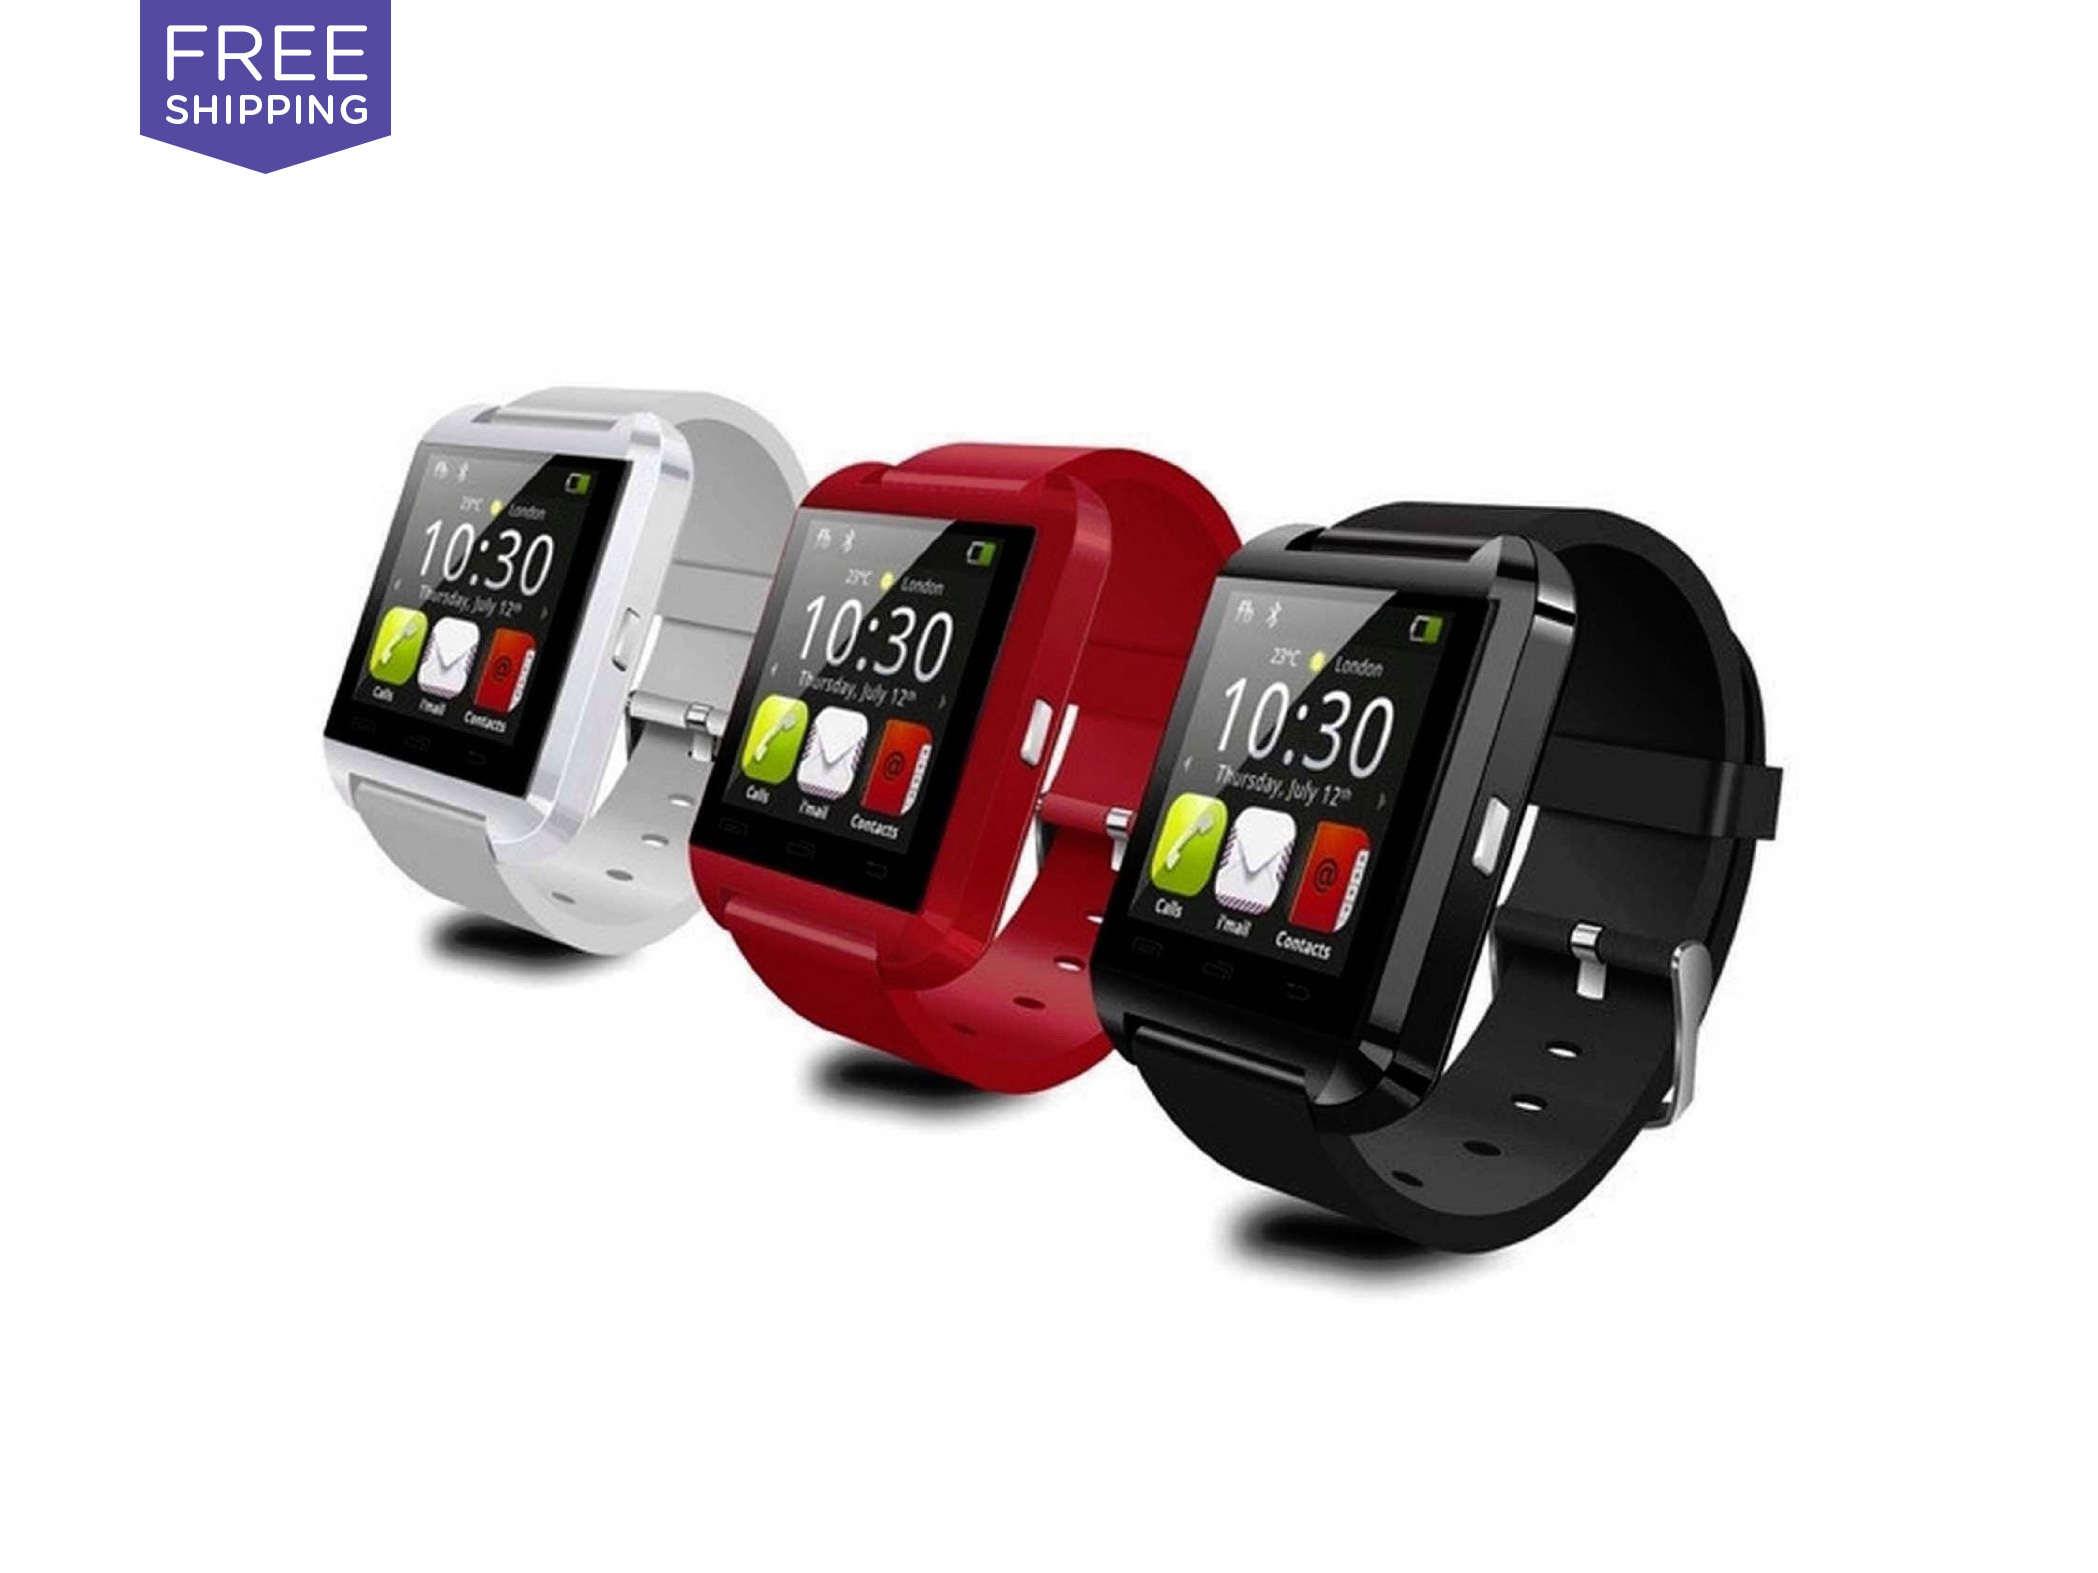 U8 Bluetooth Wristwatch  U8 Bluetooth Wristwatch, $39.99  Deal Run Date Ends: 10/2/15